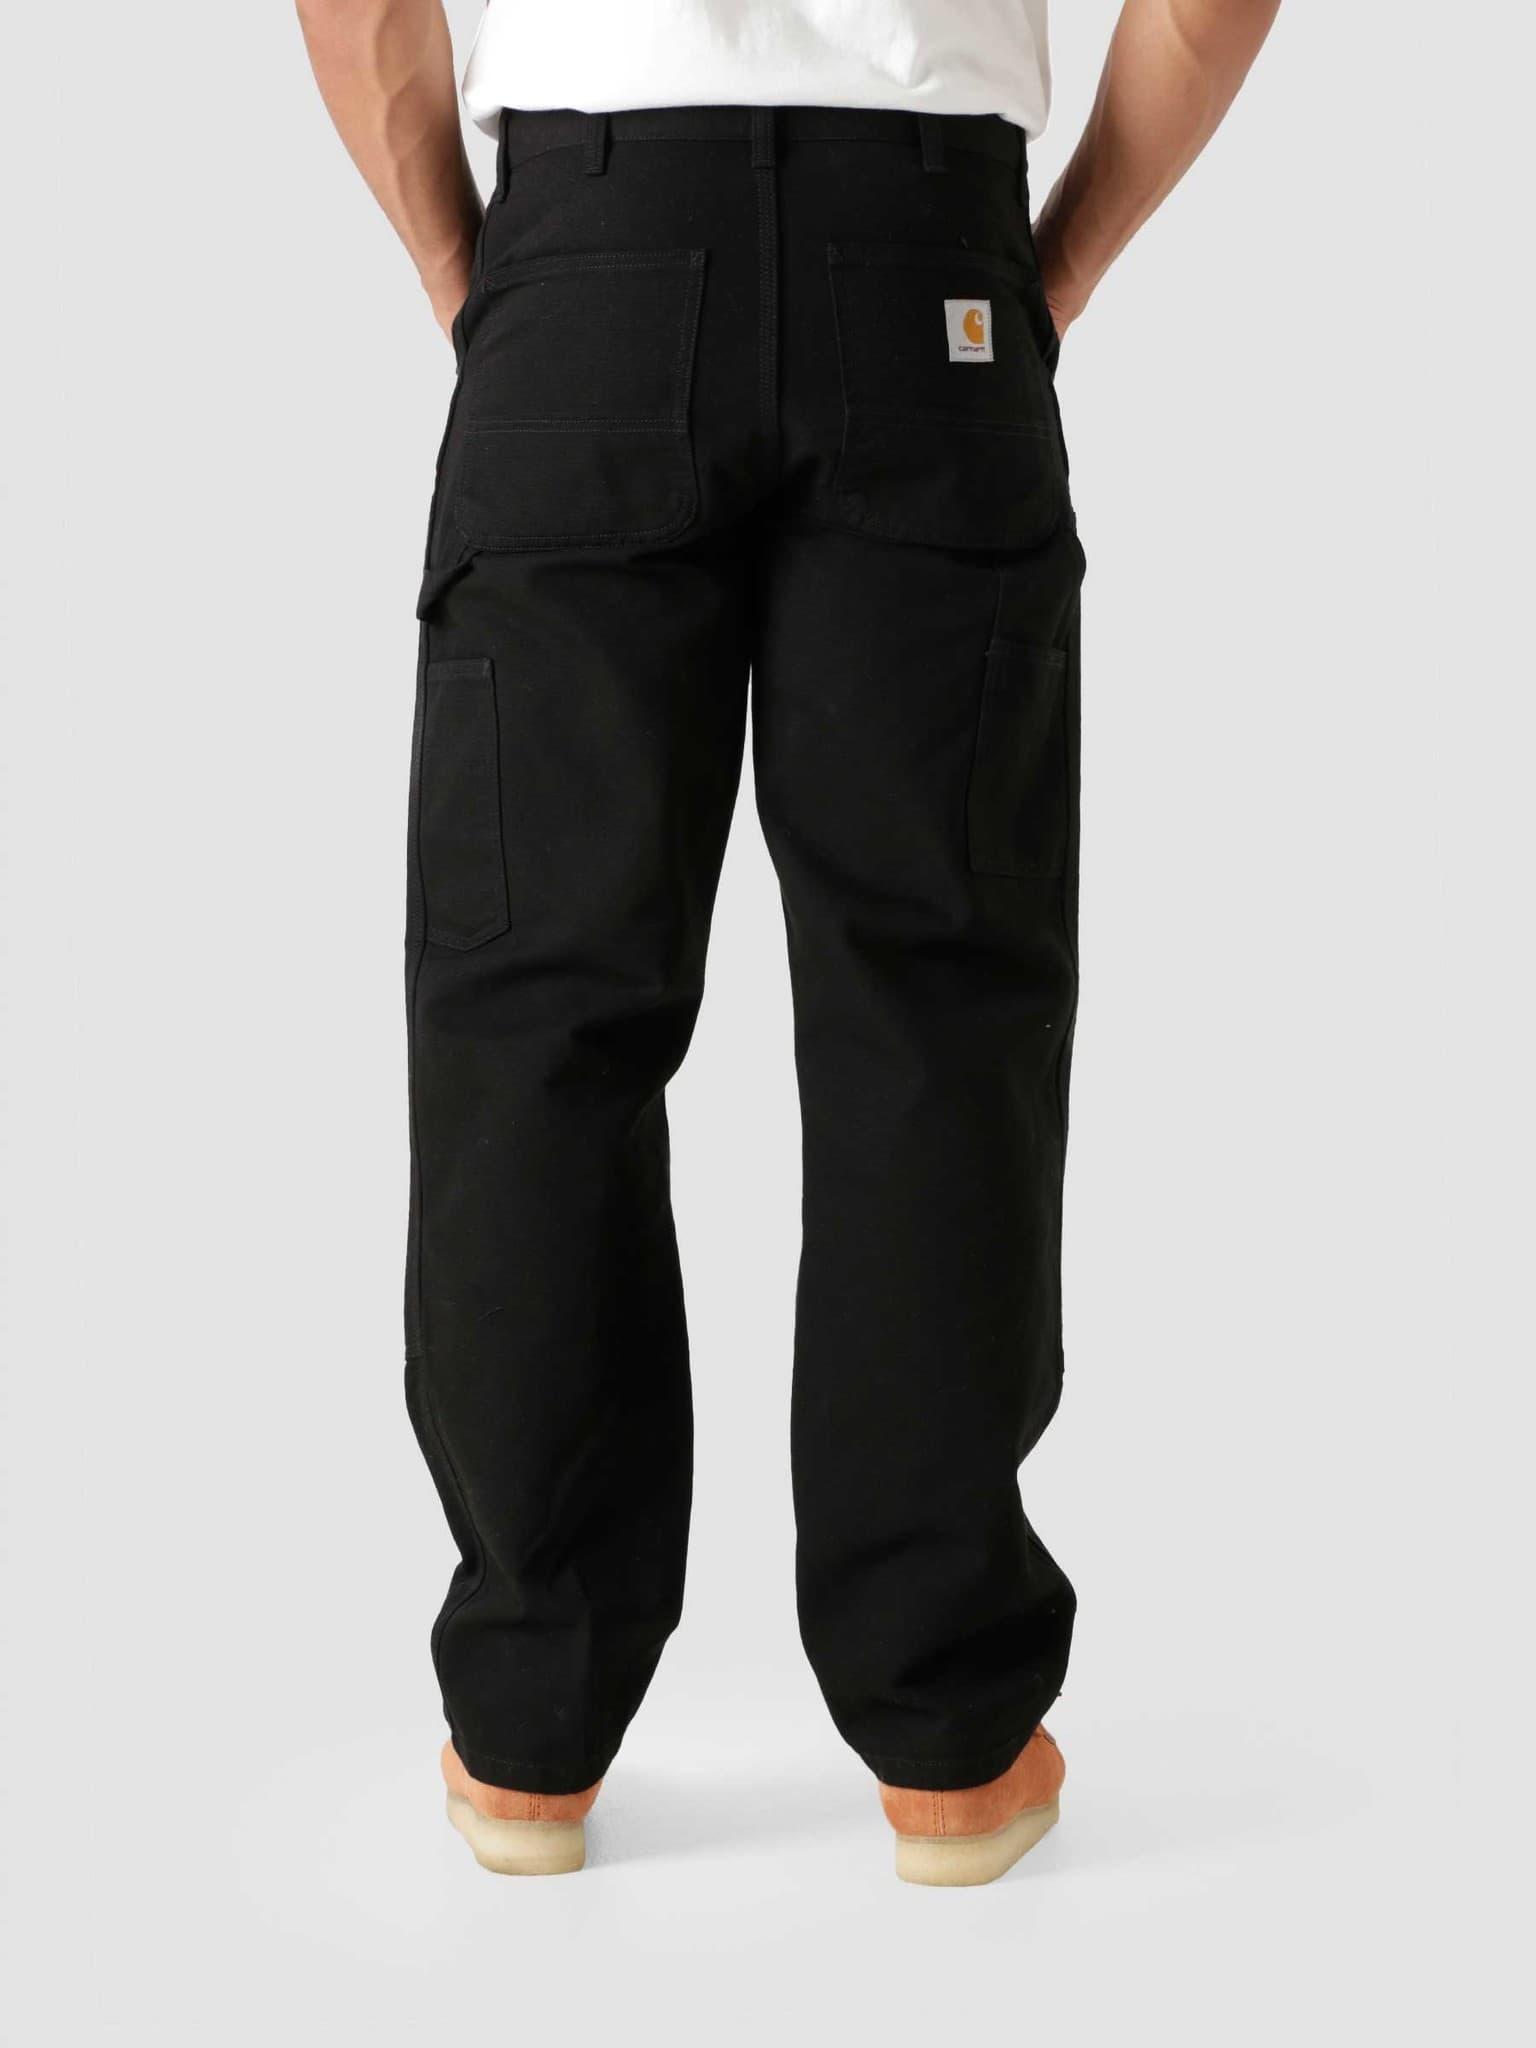 Double Knee Pant Black Rinsed I029196-8902